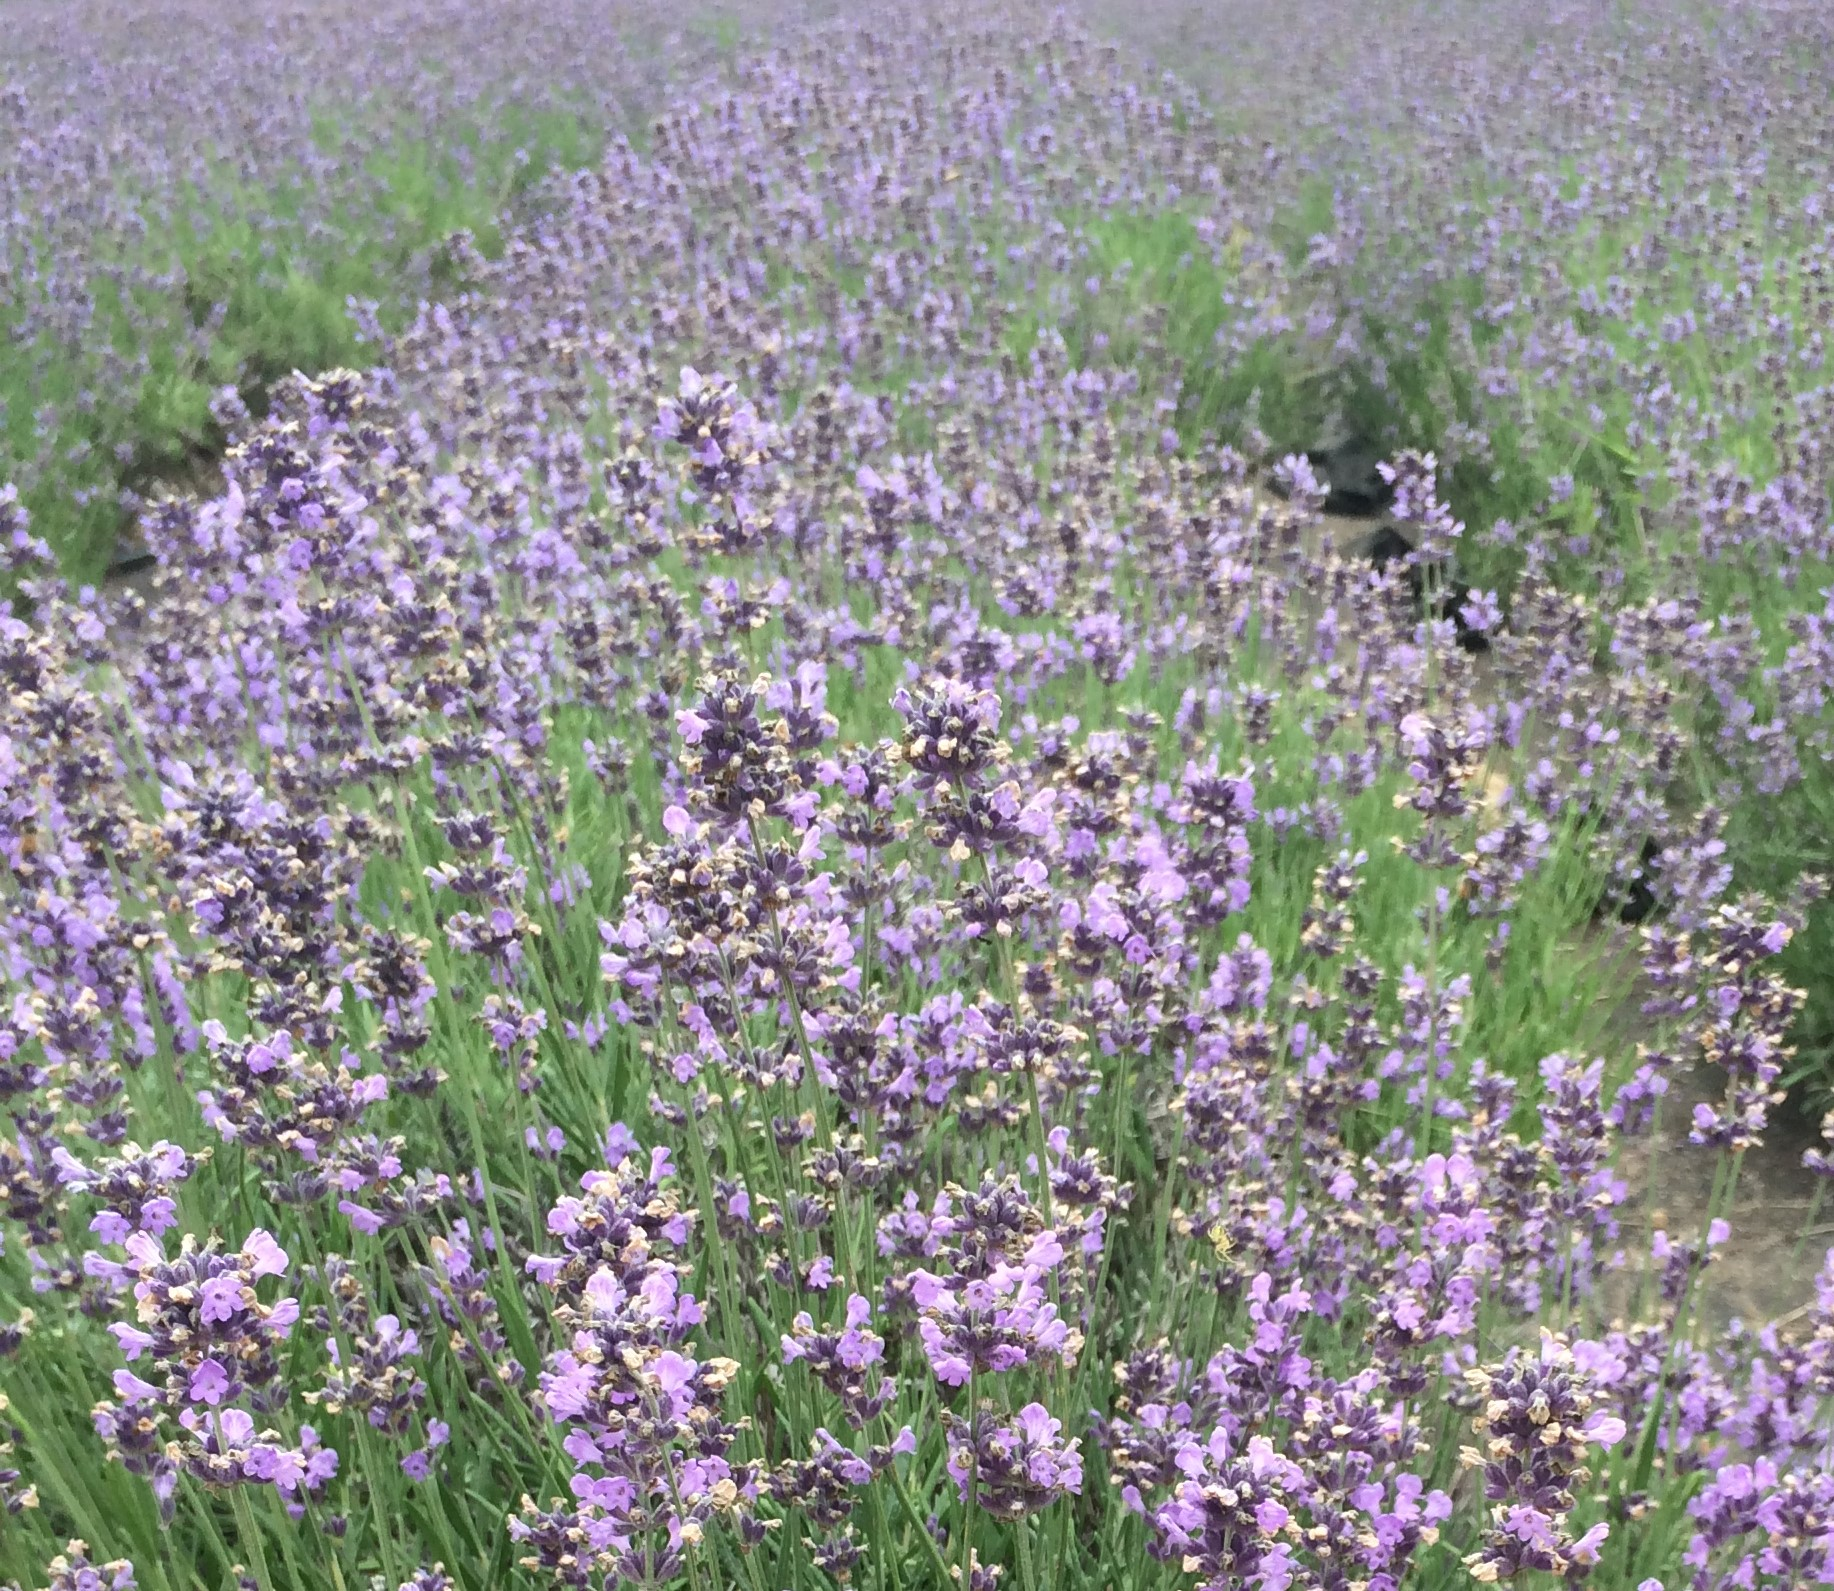 IMG 1435 2 - Daytrip From Seoul: Hani Lavender Farm (하늬 라벤더 팜)